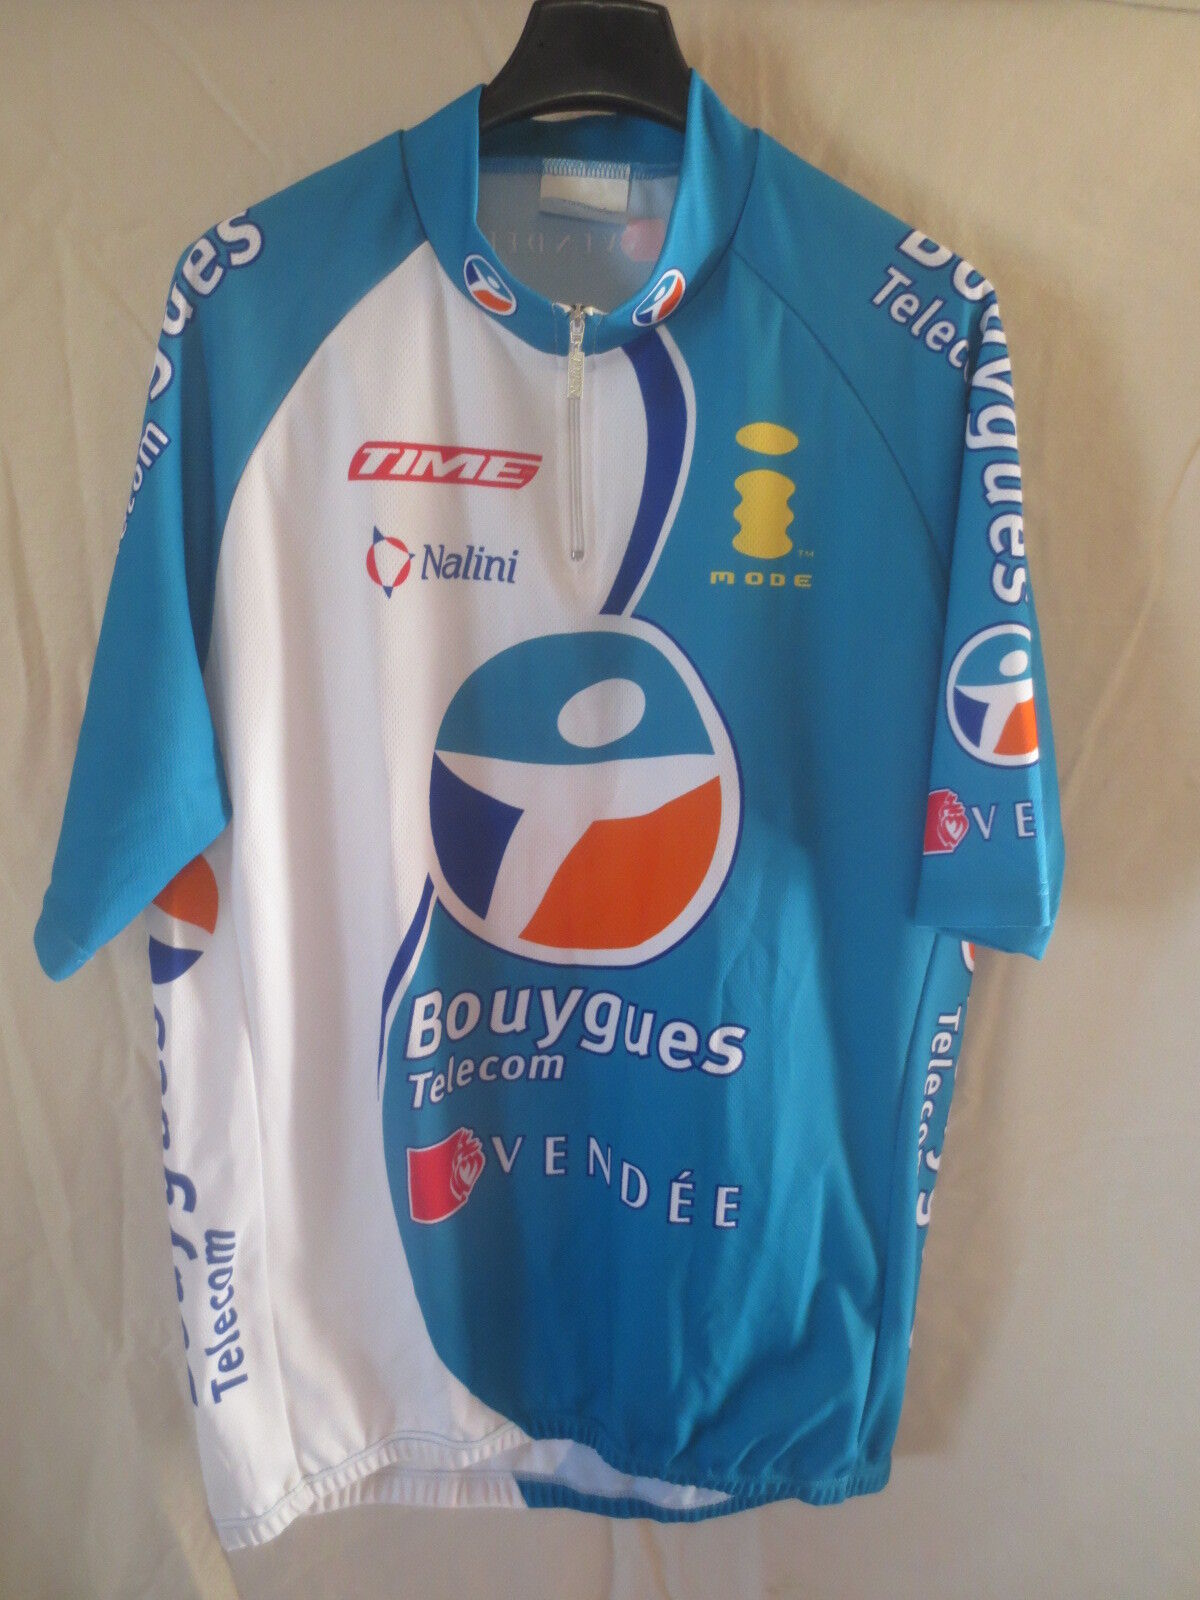 Cycling jersey Bouygues telecom tour 2005 nalini shirt jersey xxl Chavanel